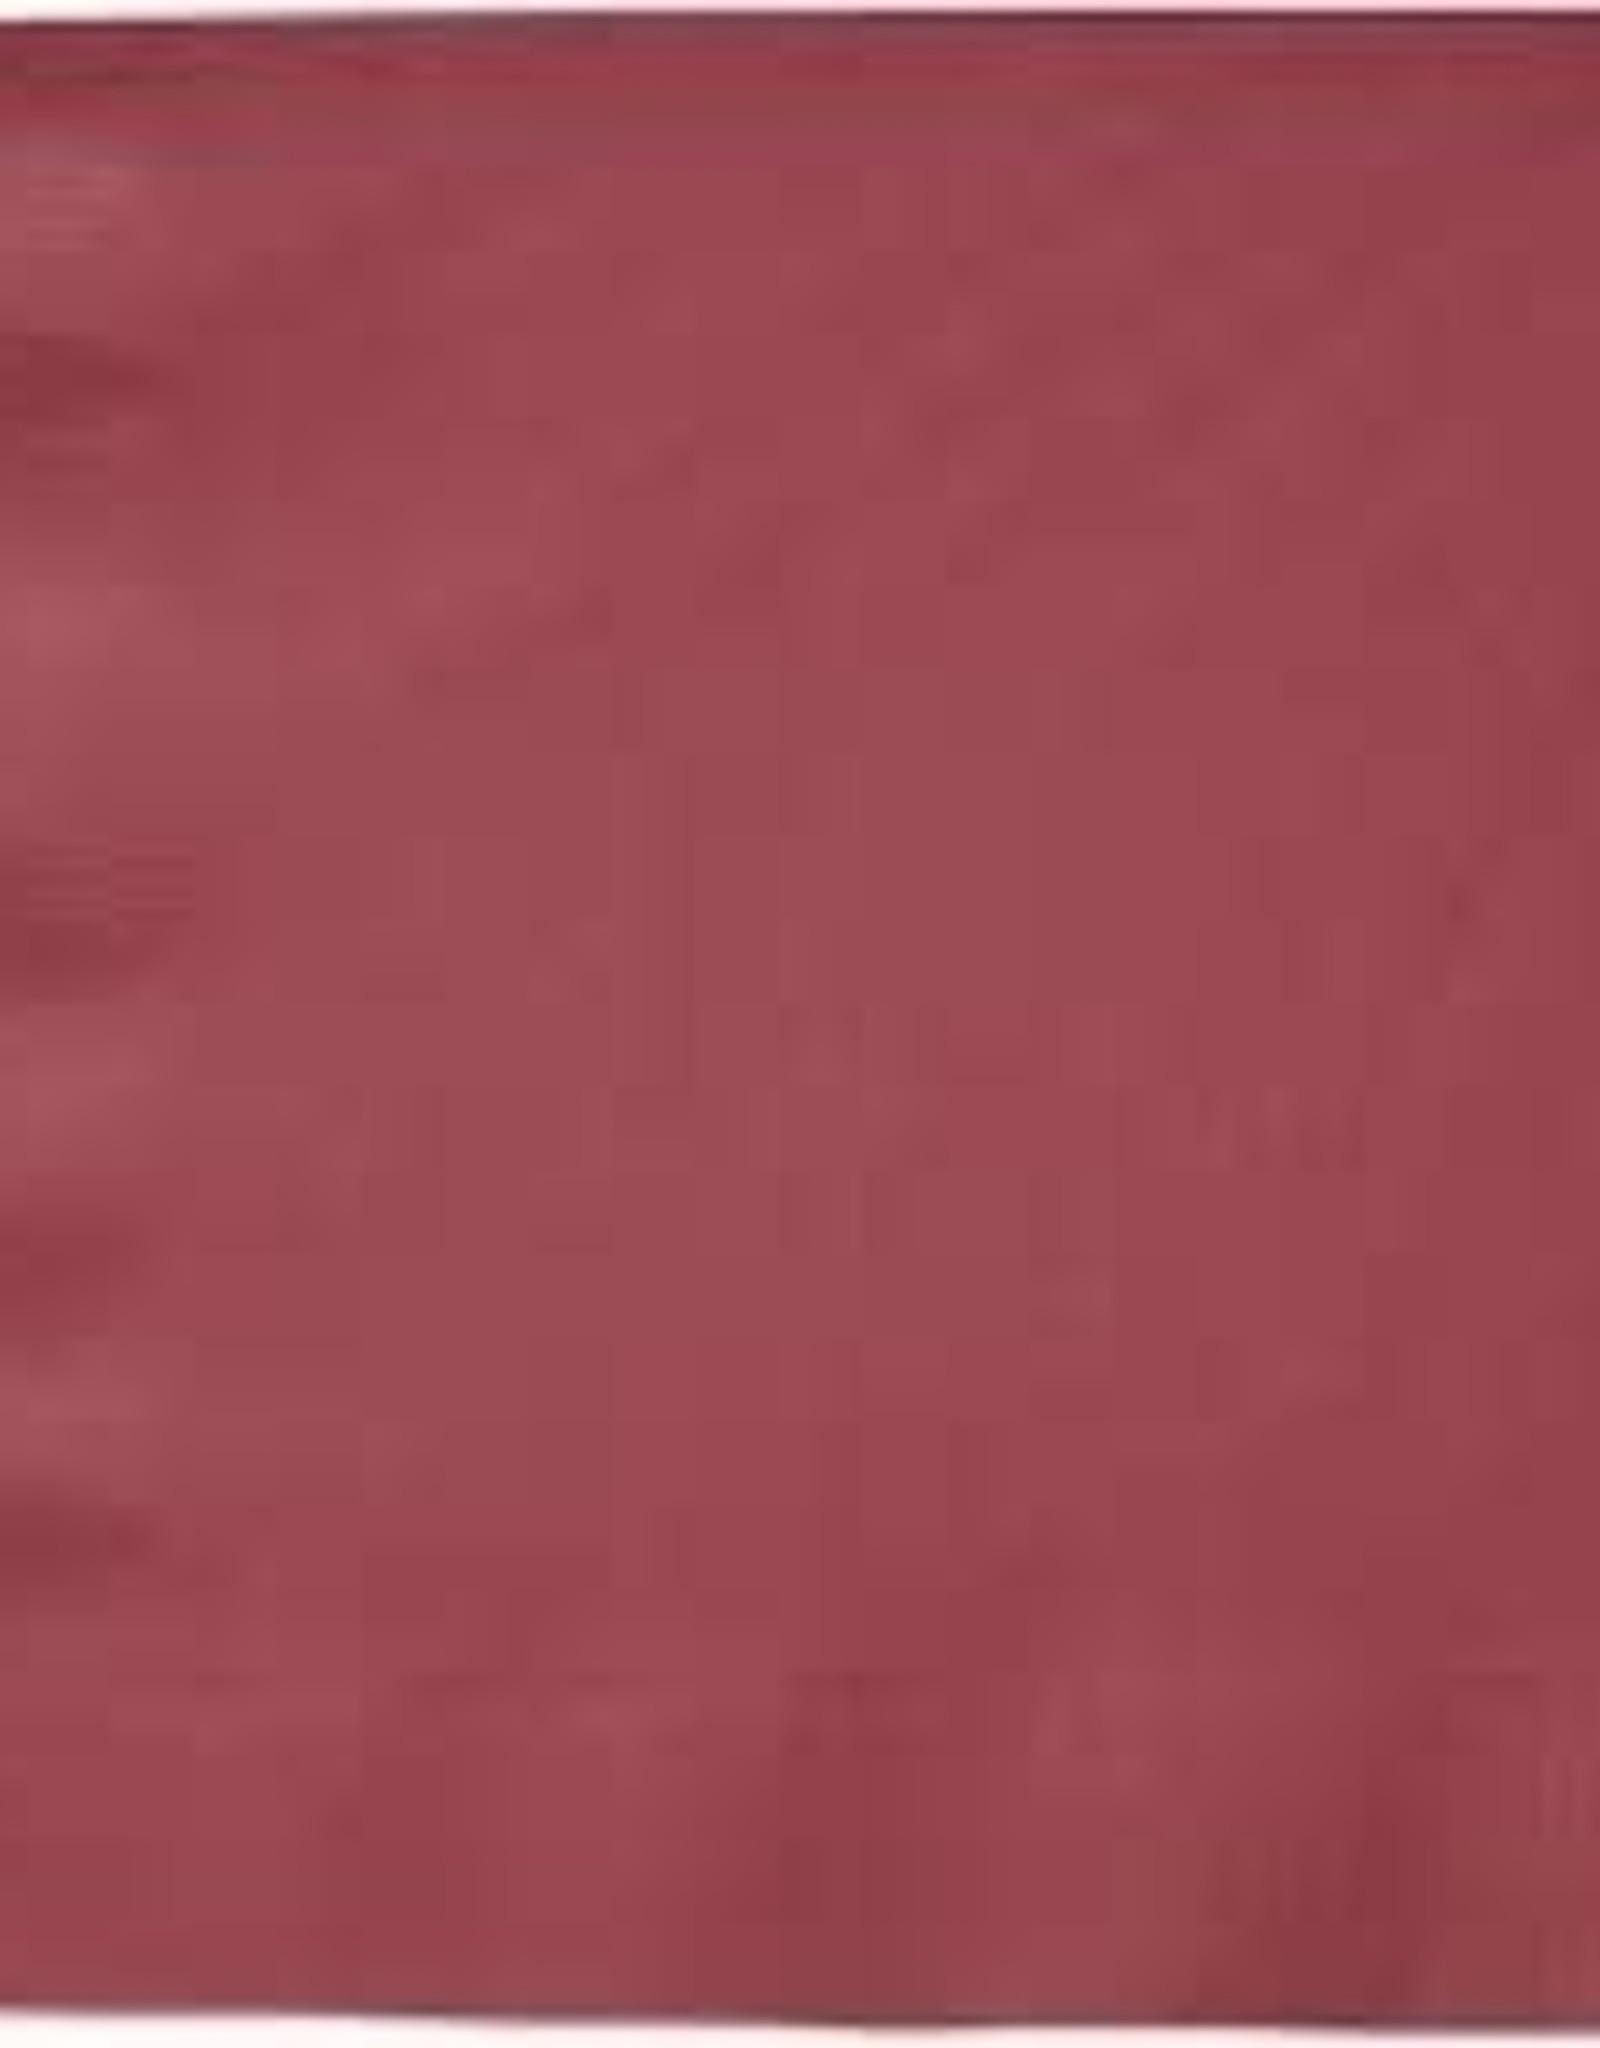 Burgundy  Napkins 50 count 12 7/8 x 12 7/8